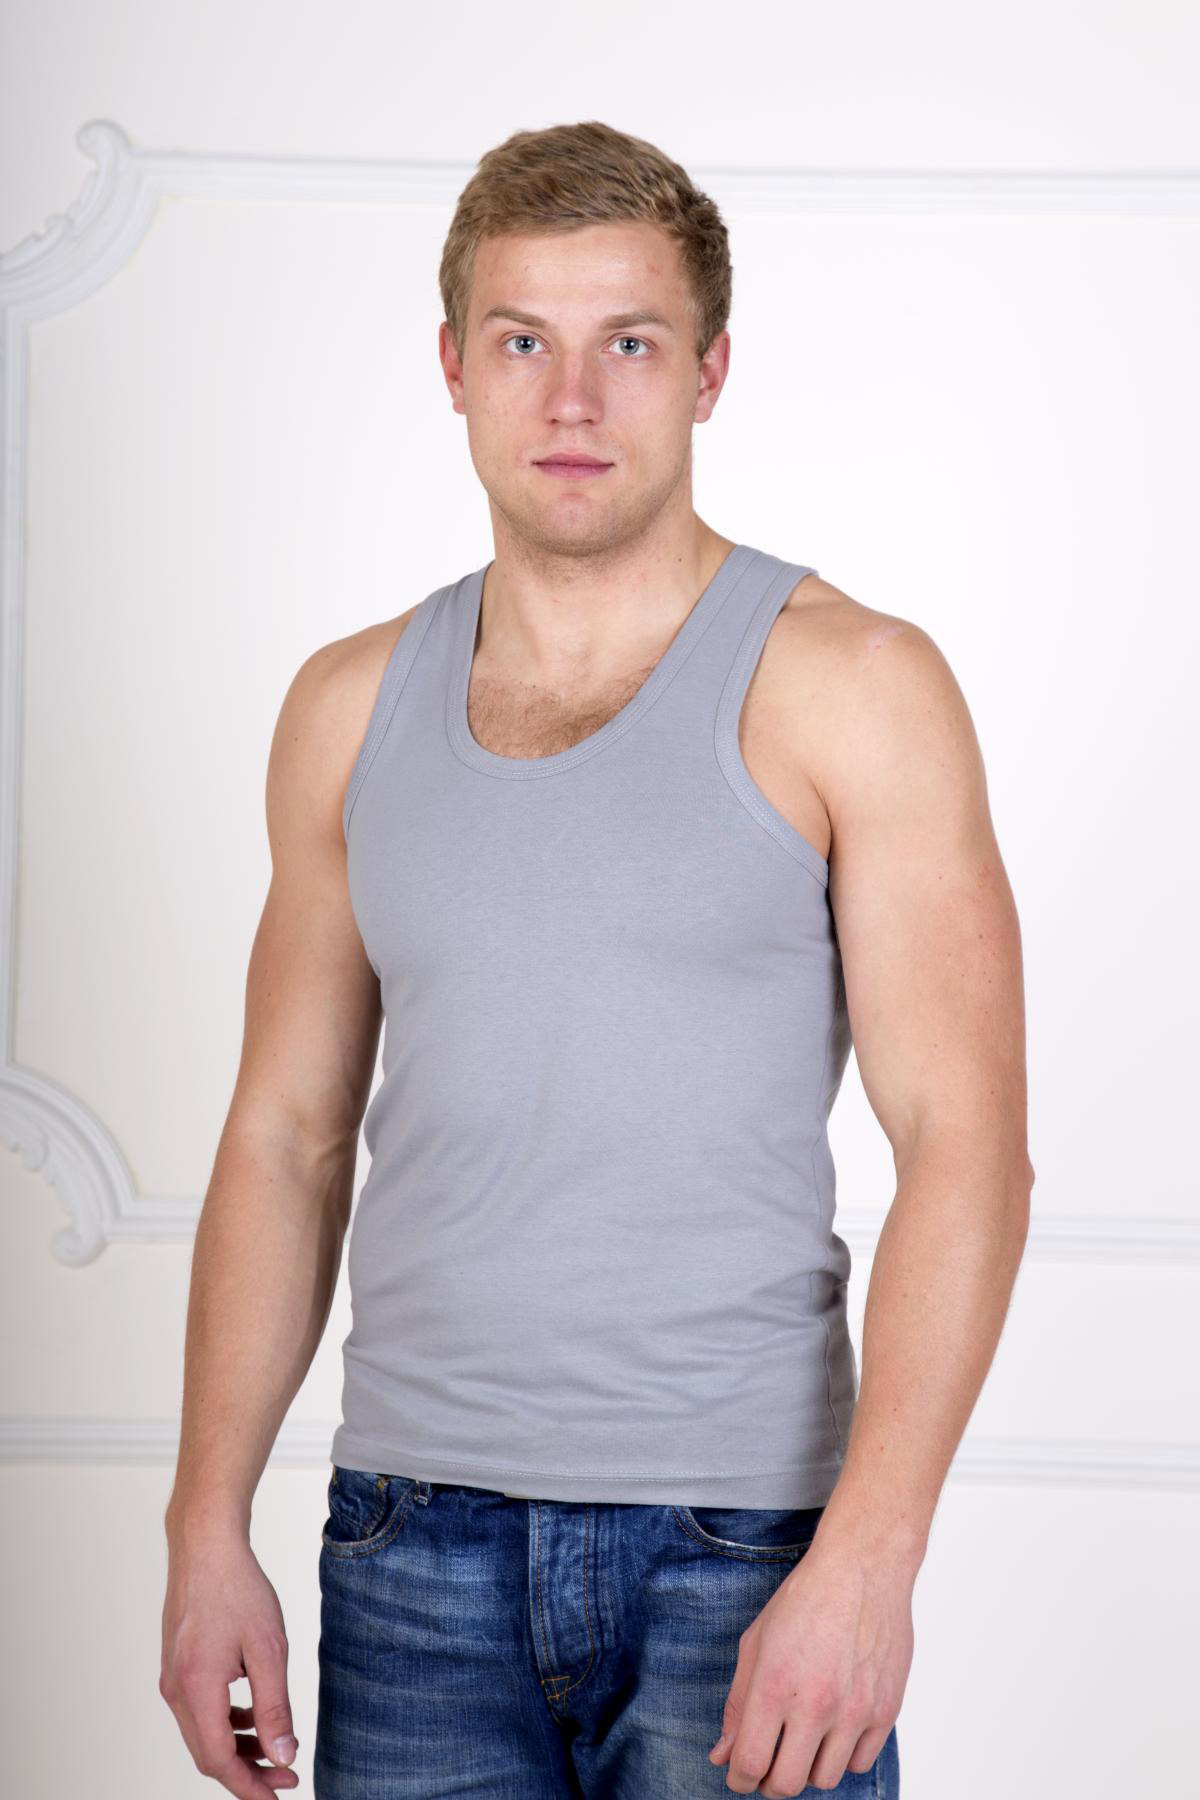 Муж. майка Верн Серый р. 56Майки и футболки<br>Факт. ОГ: 102 см <br>Факт. ОТ: 98 см <br>Факт. ОБ: 102 см <br>Длина по спинке: 77 см<br><br>Тип: Муж. майка<br>Размер: 56<br>Материал: Кулирка